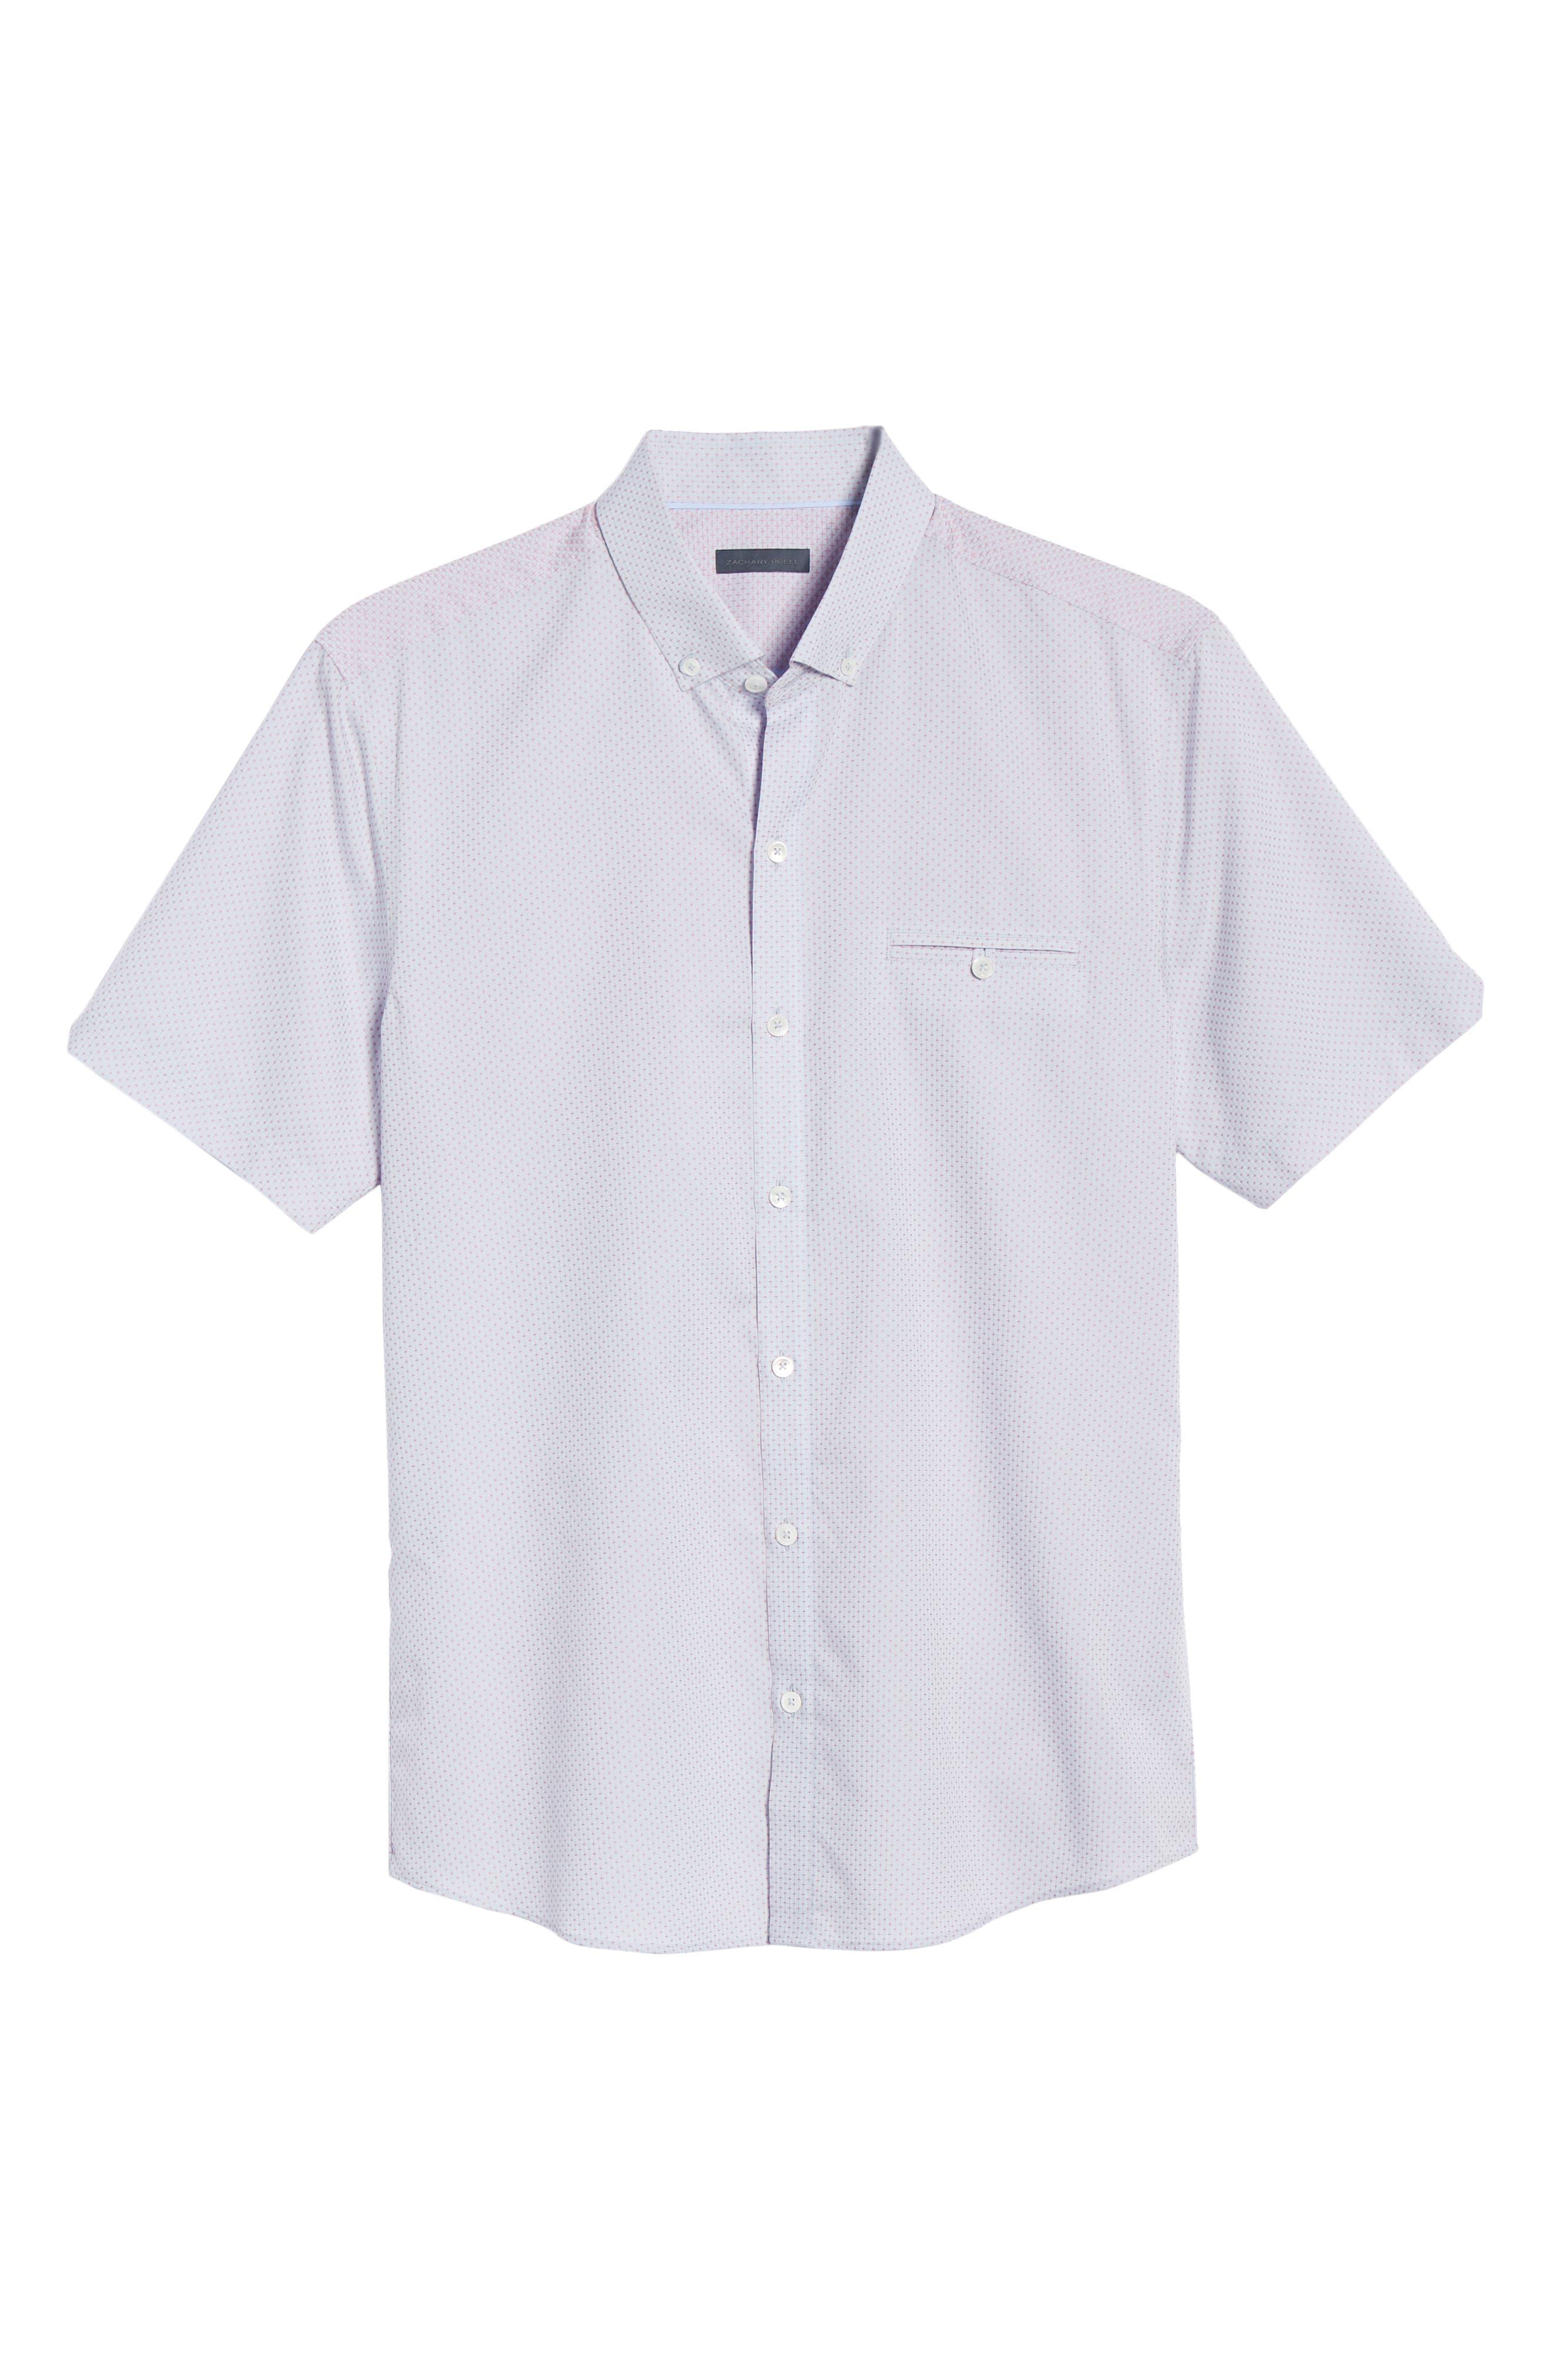 ZACHARY PRELL, McGrew Regular Fit Sport Shirt, Alternate thumbnail 5, color, FLAMINGO